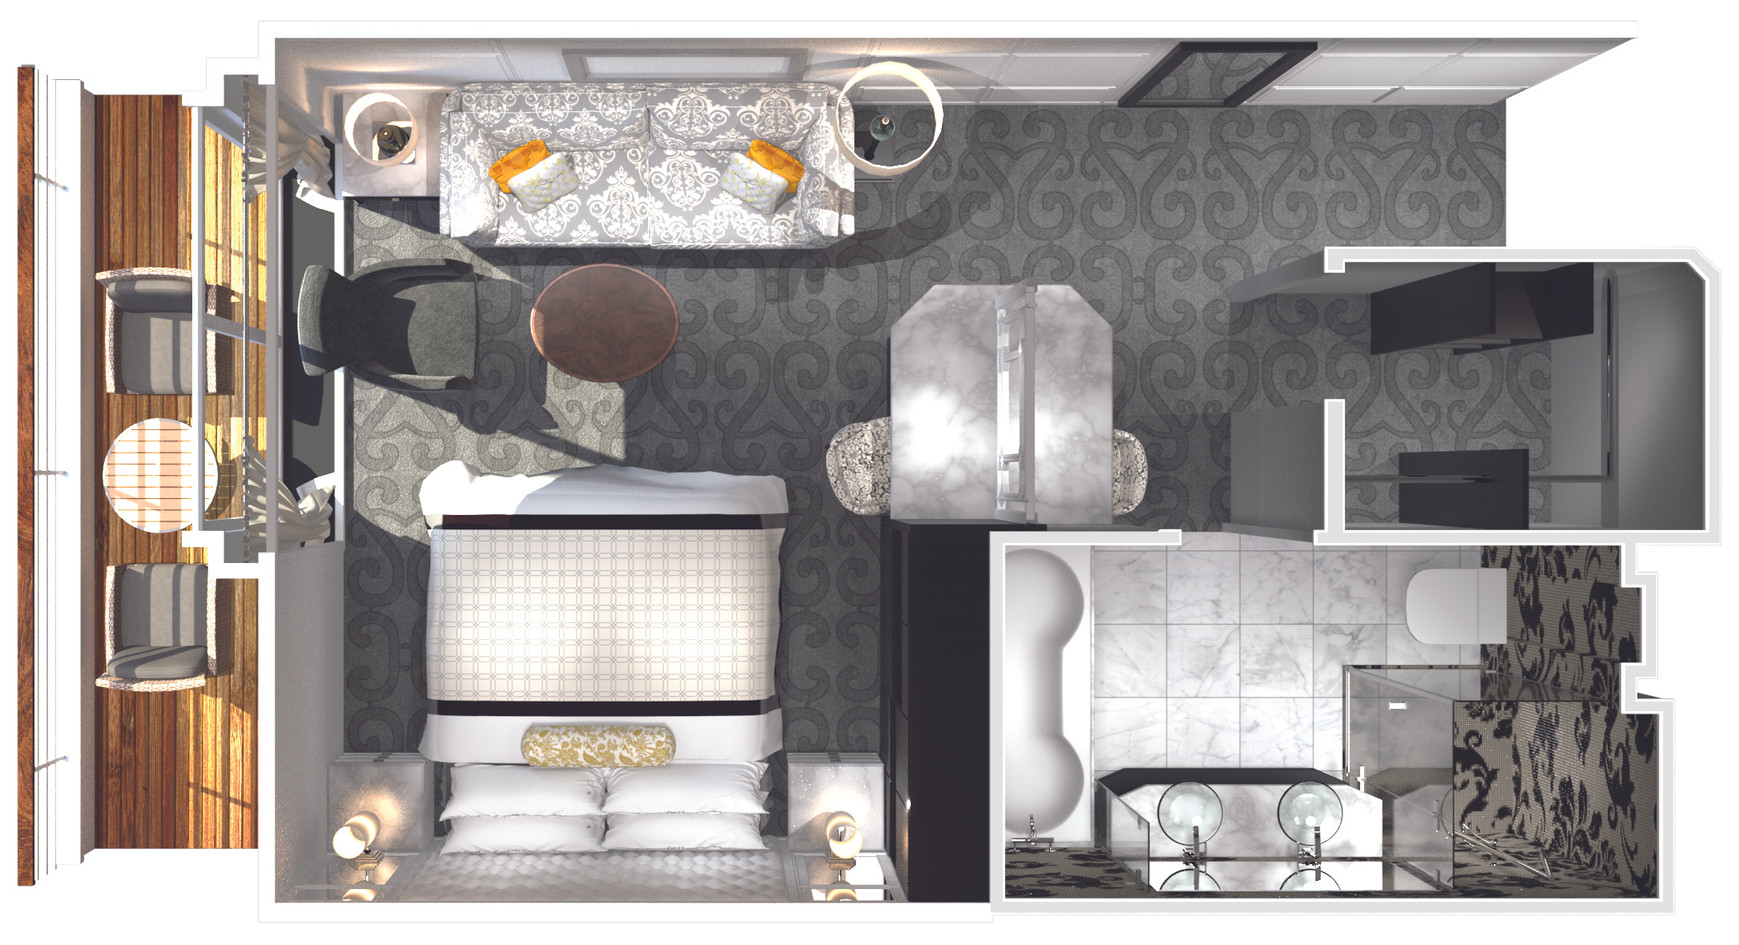 Penthouse with Verandah (PH) Layout